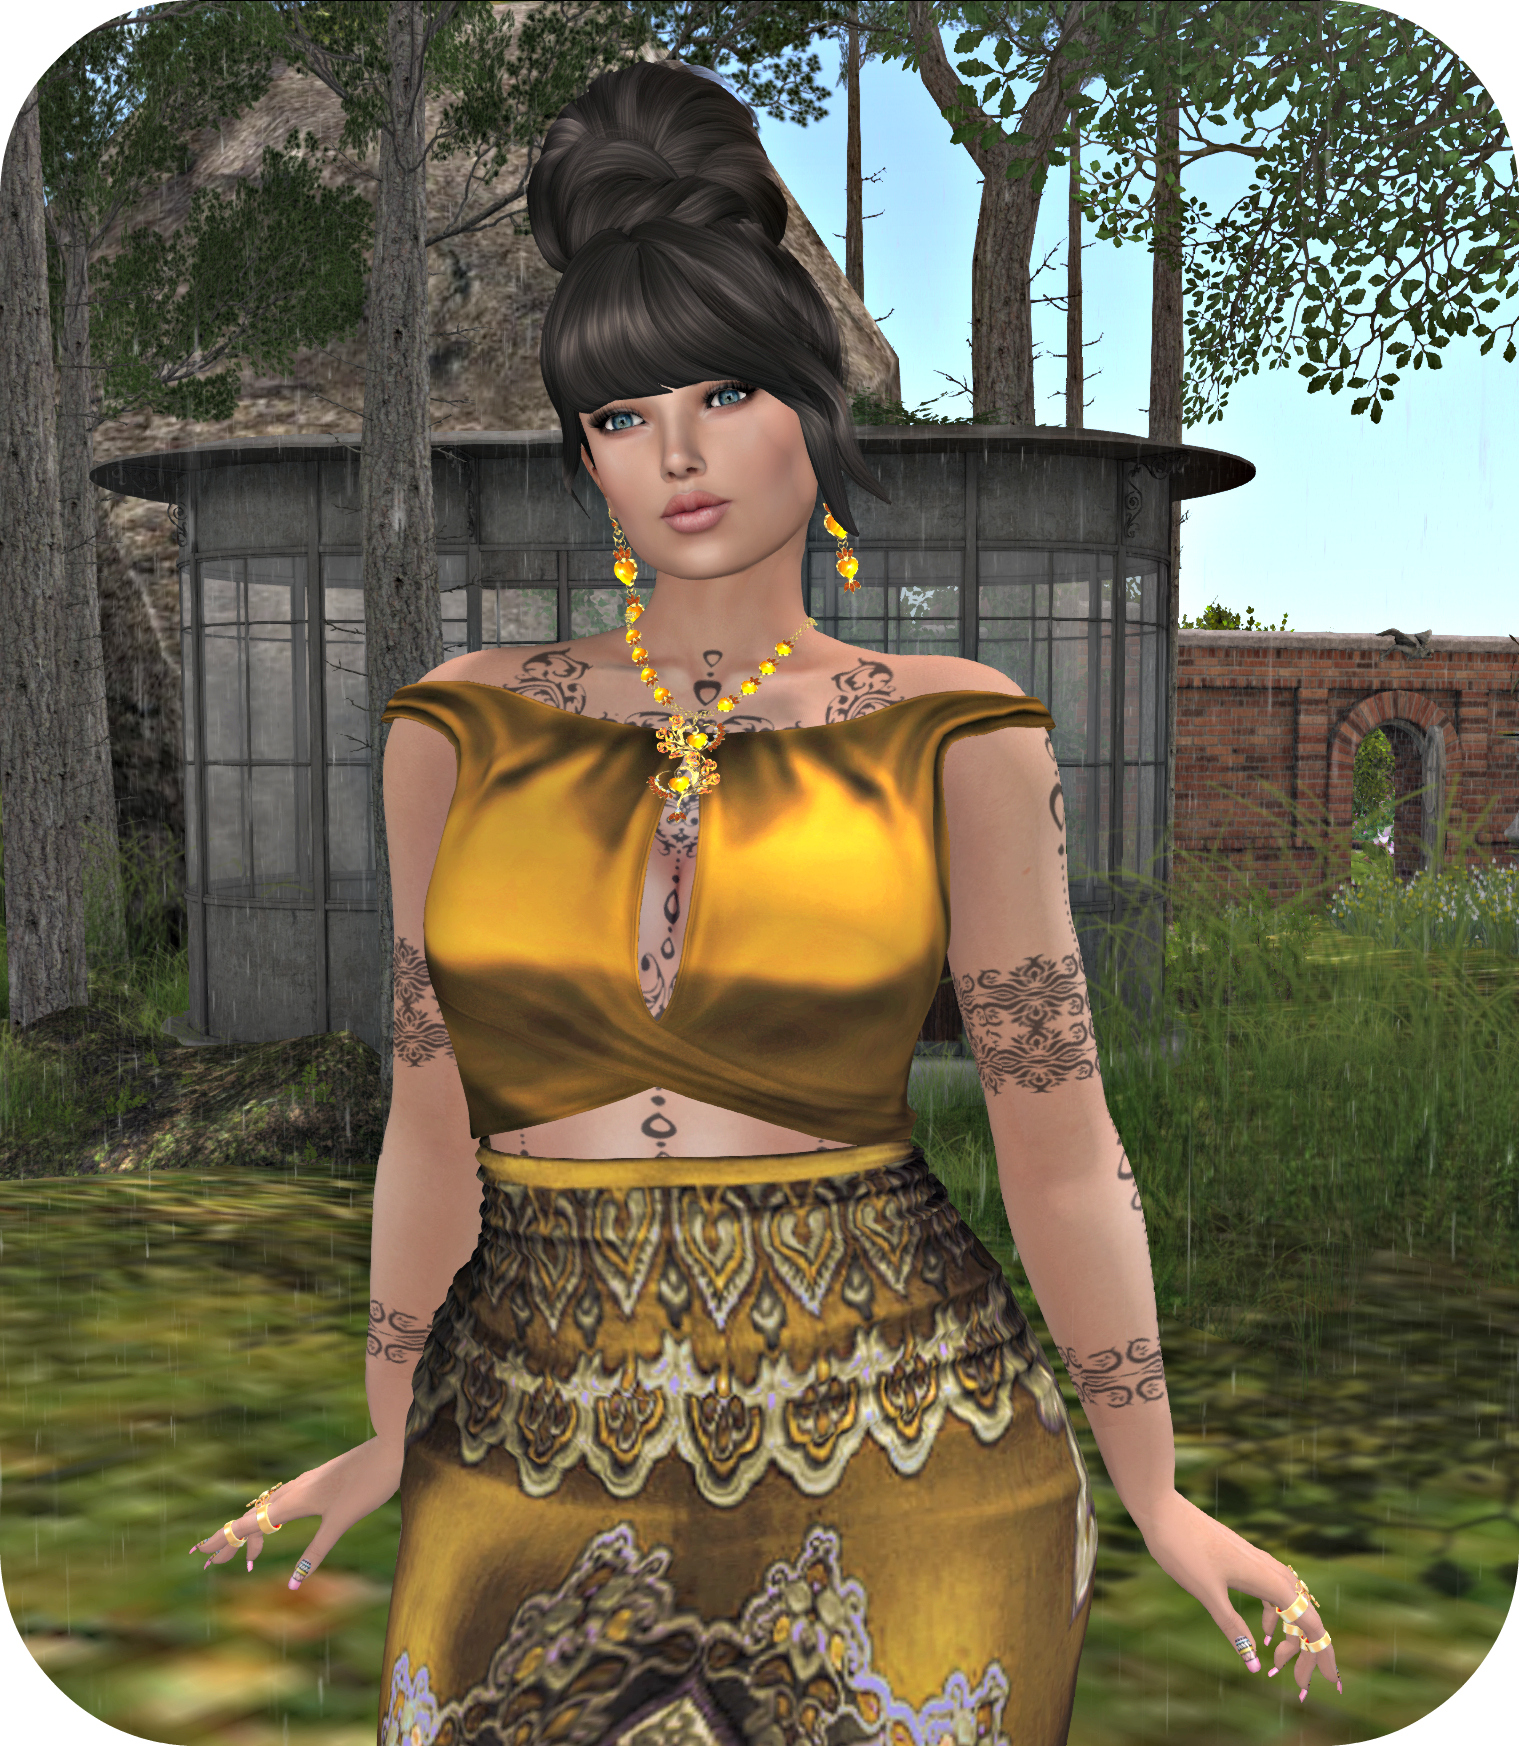 feb-25th-blog-post-photo-1hs_cropped